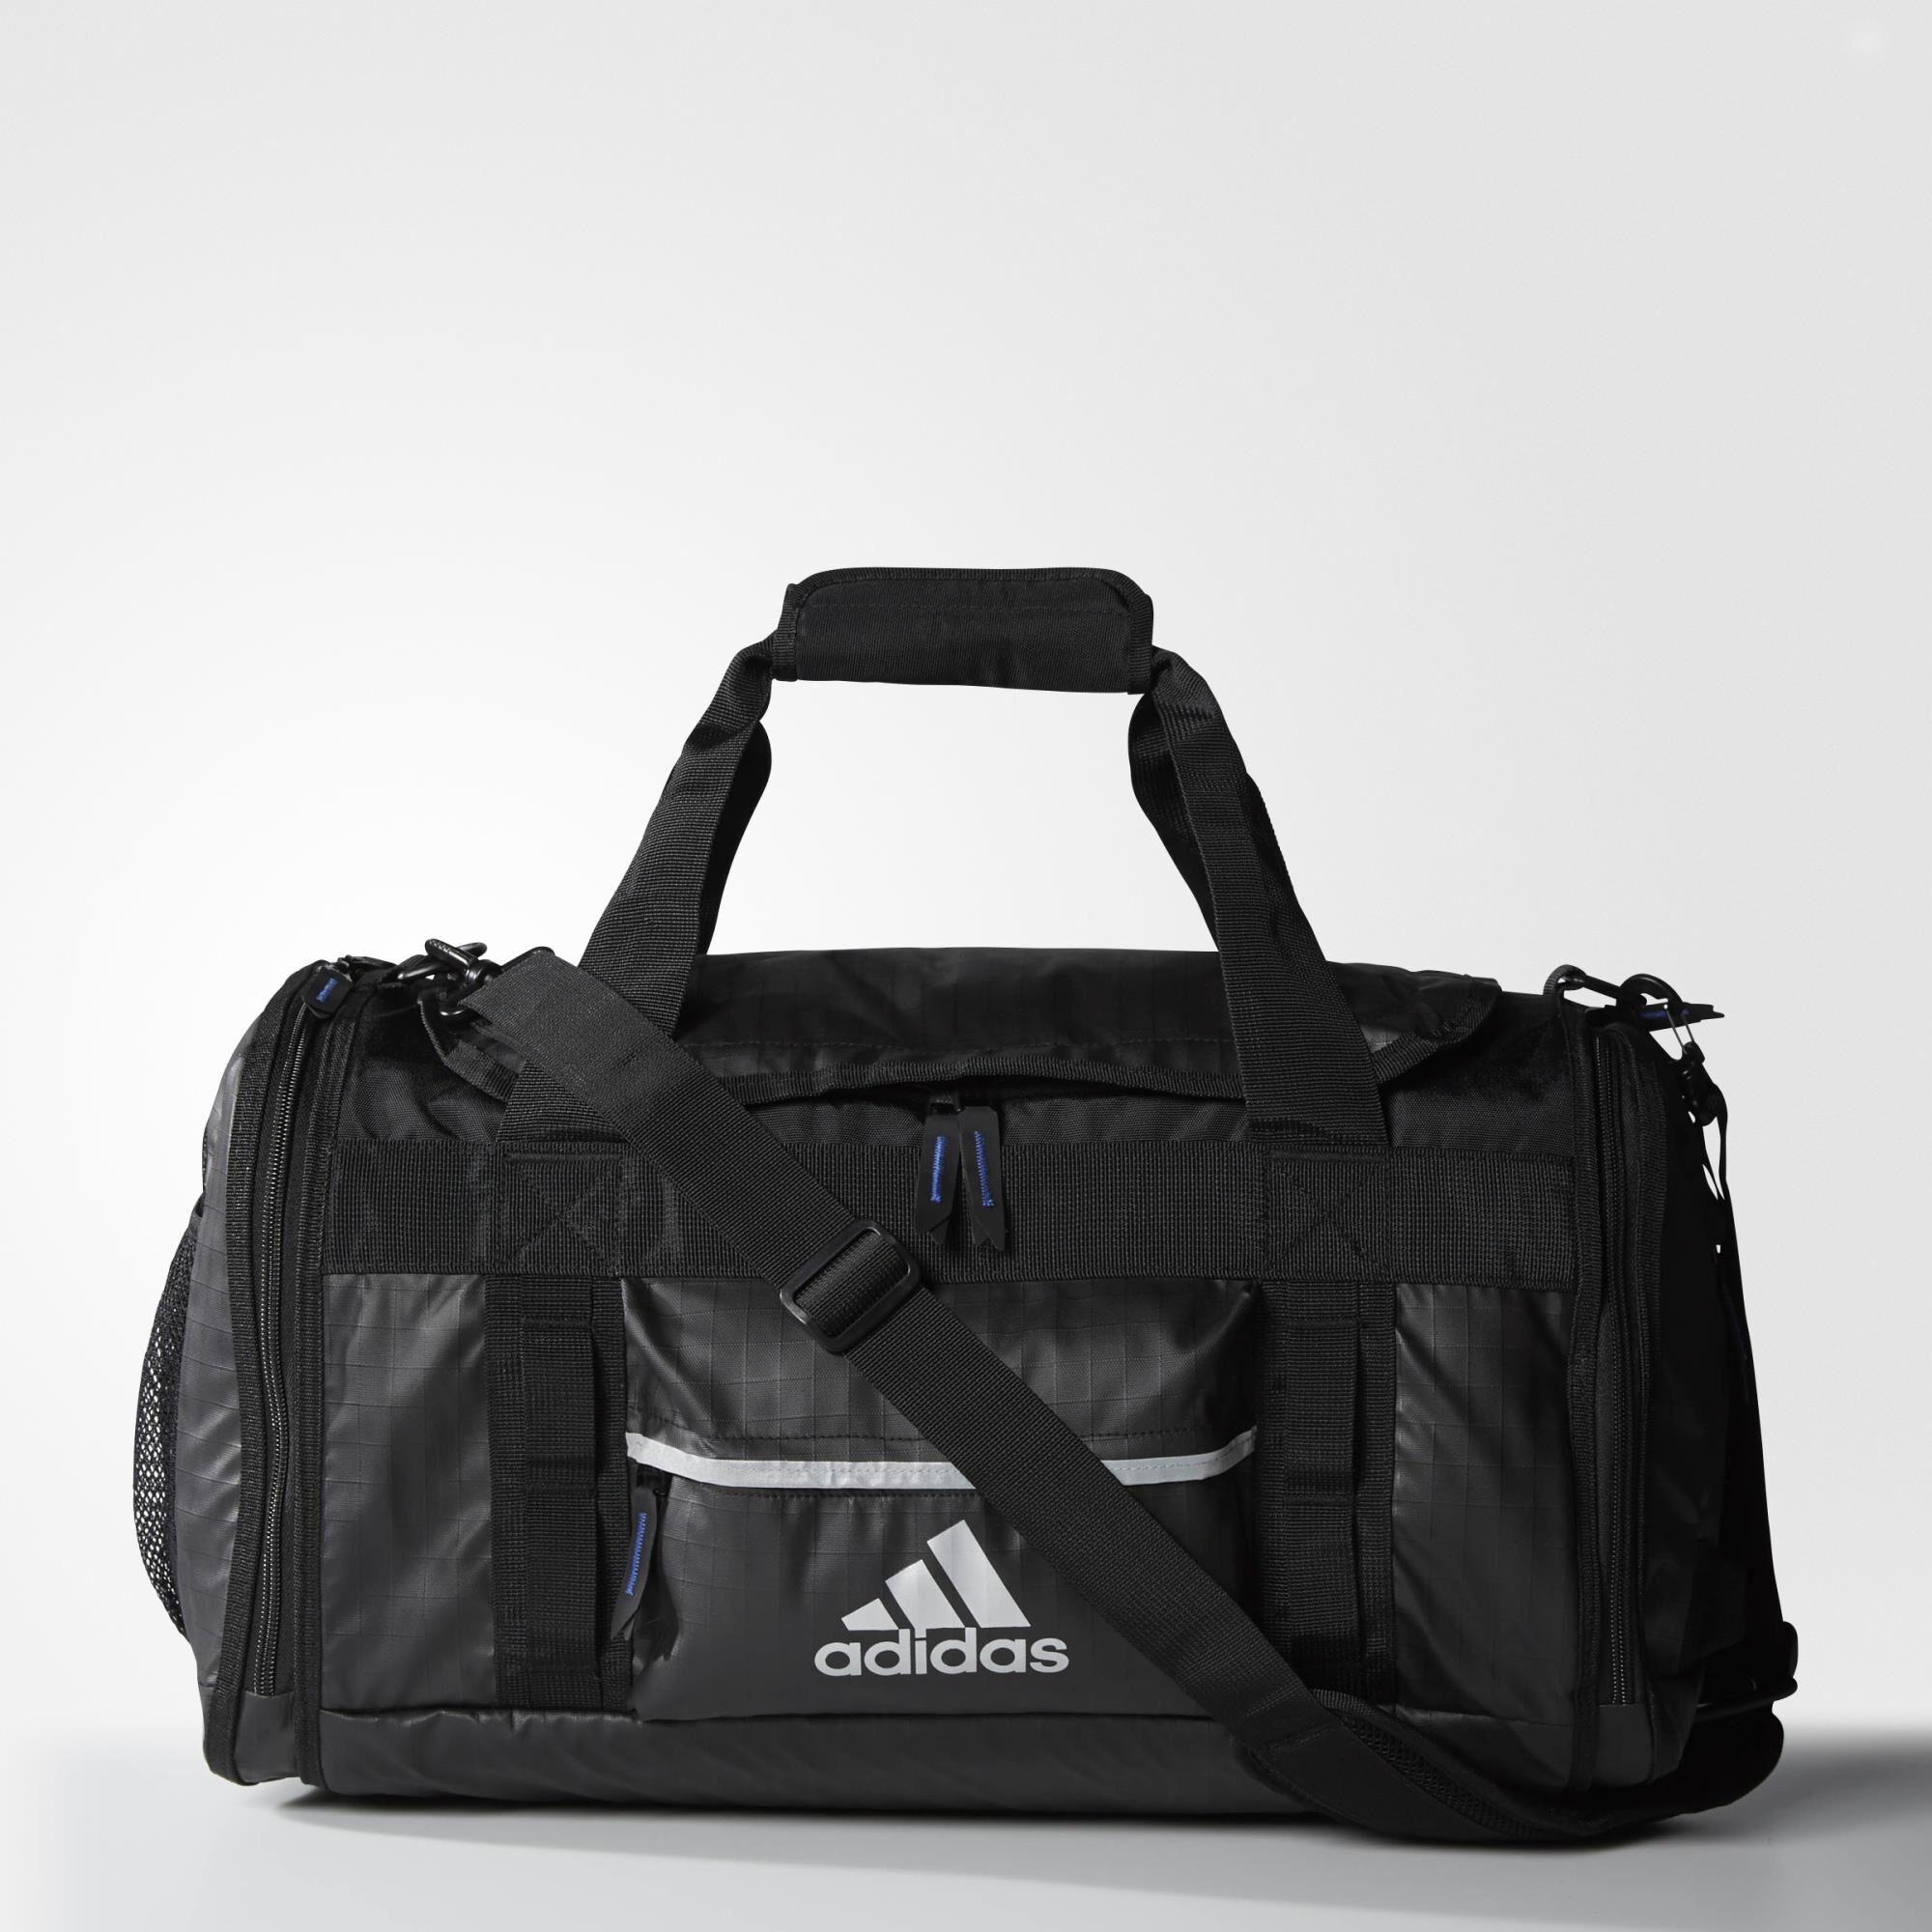 adidas Shield Duffel Bag MULTCO